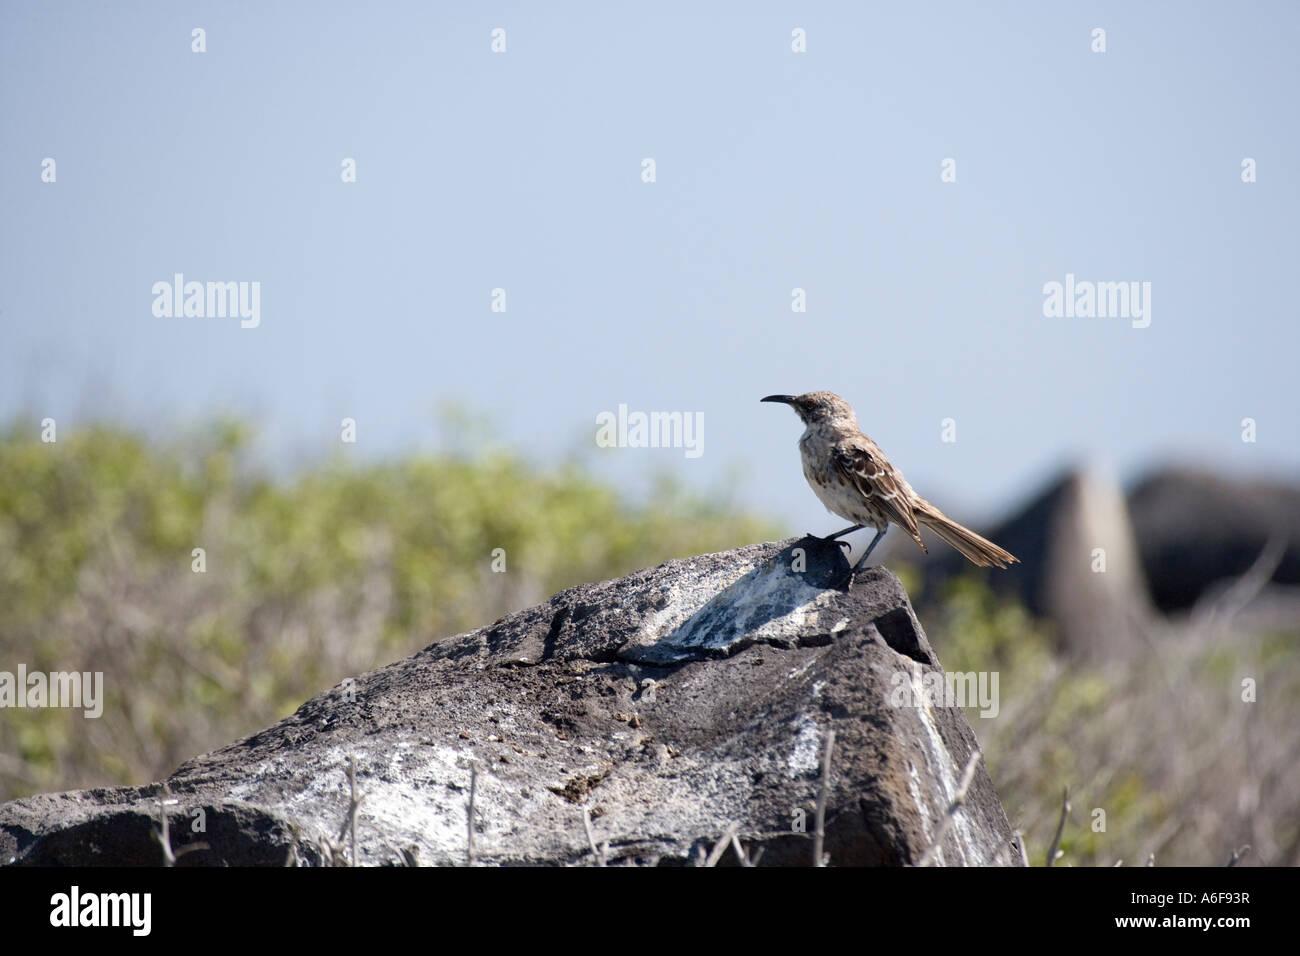 Galapagos Mocking Bird - Stock Image